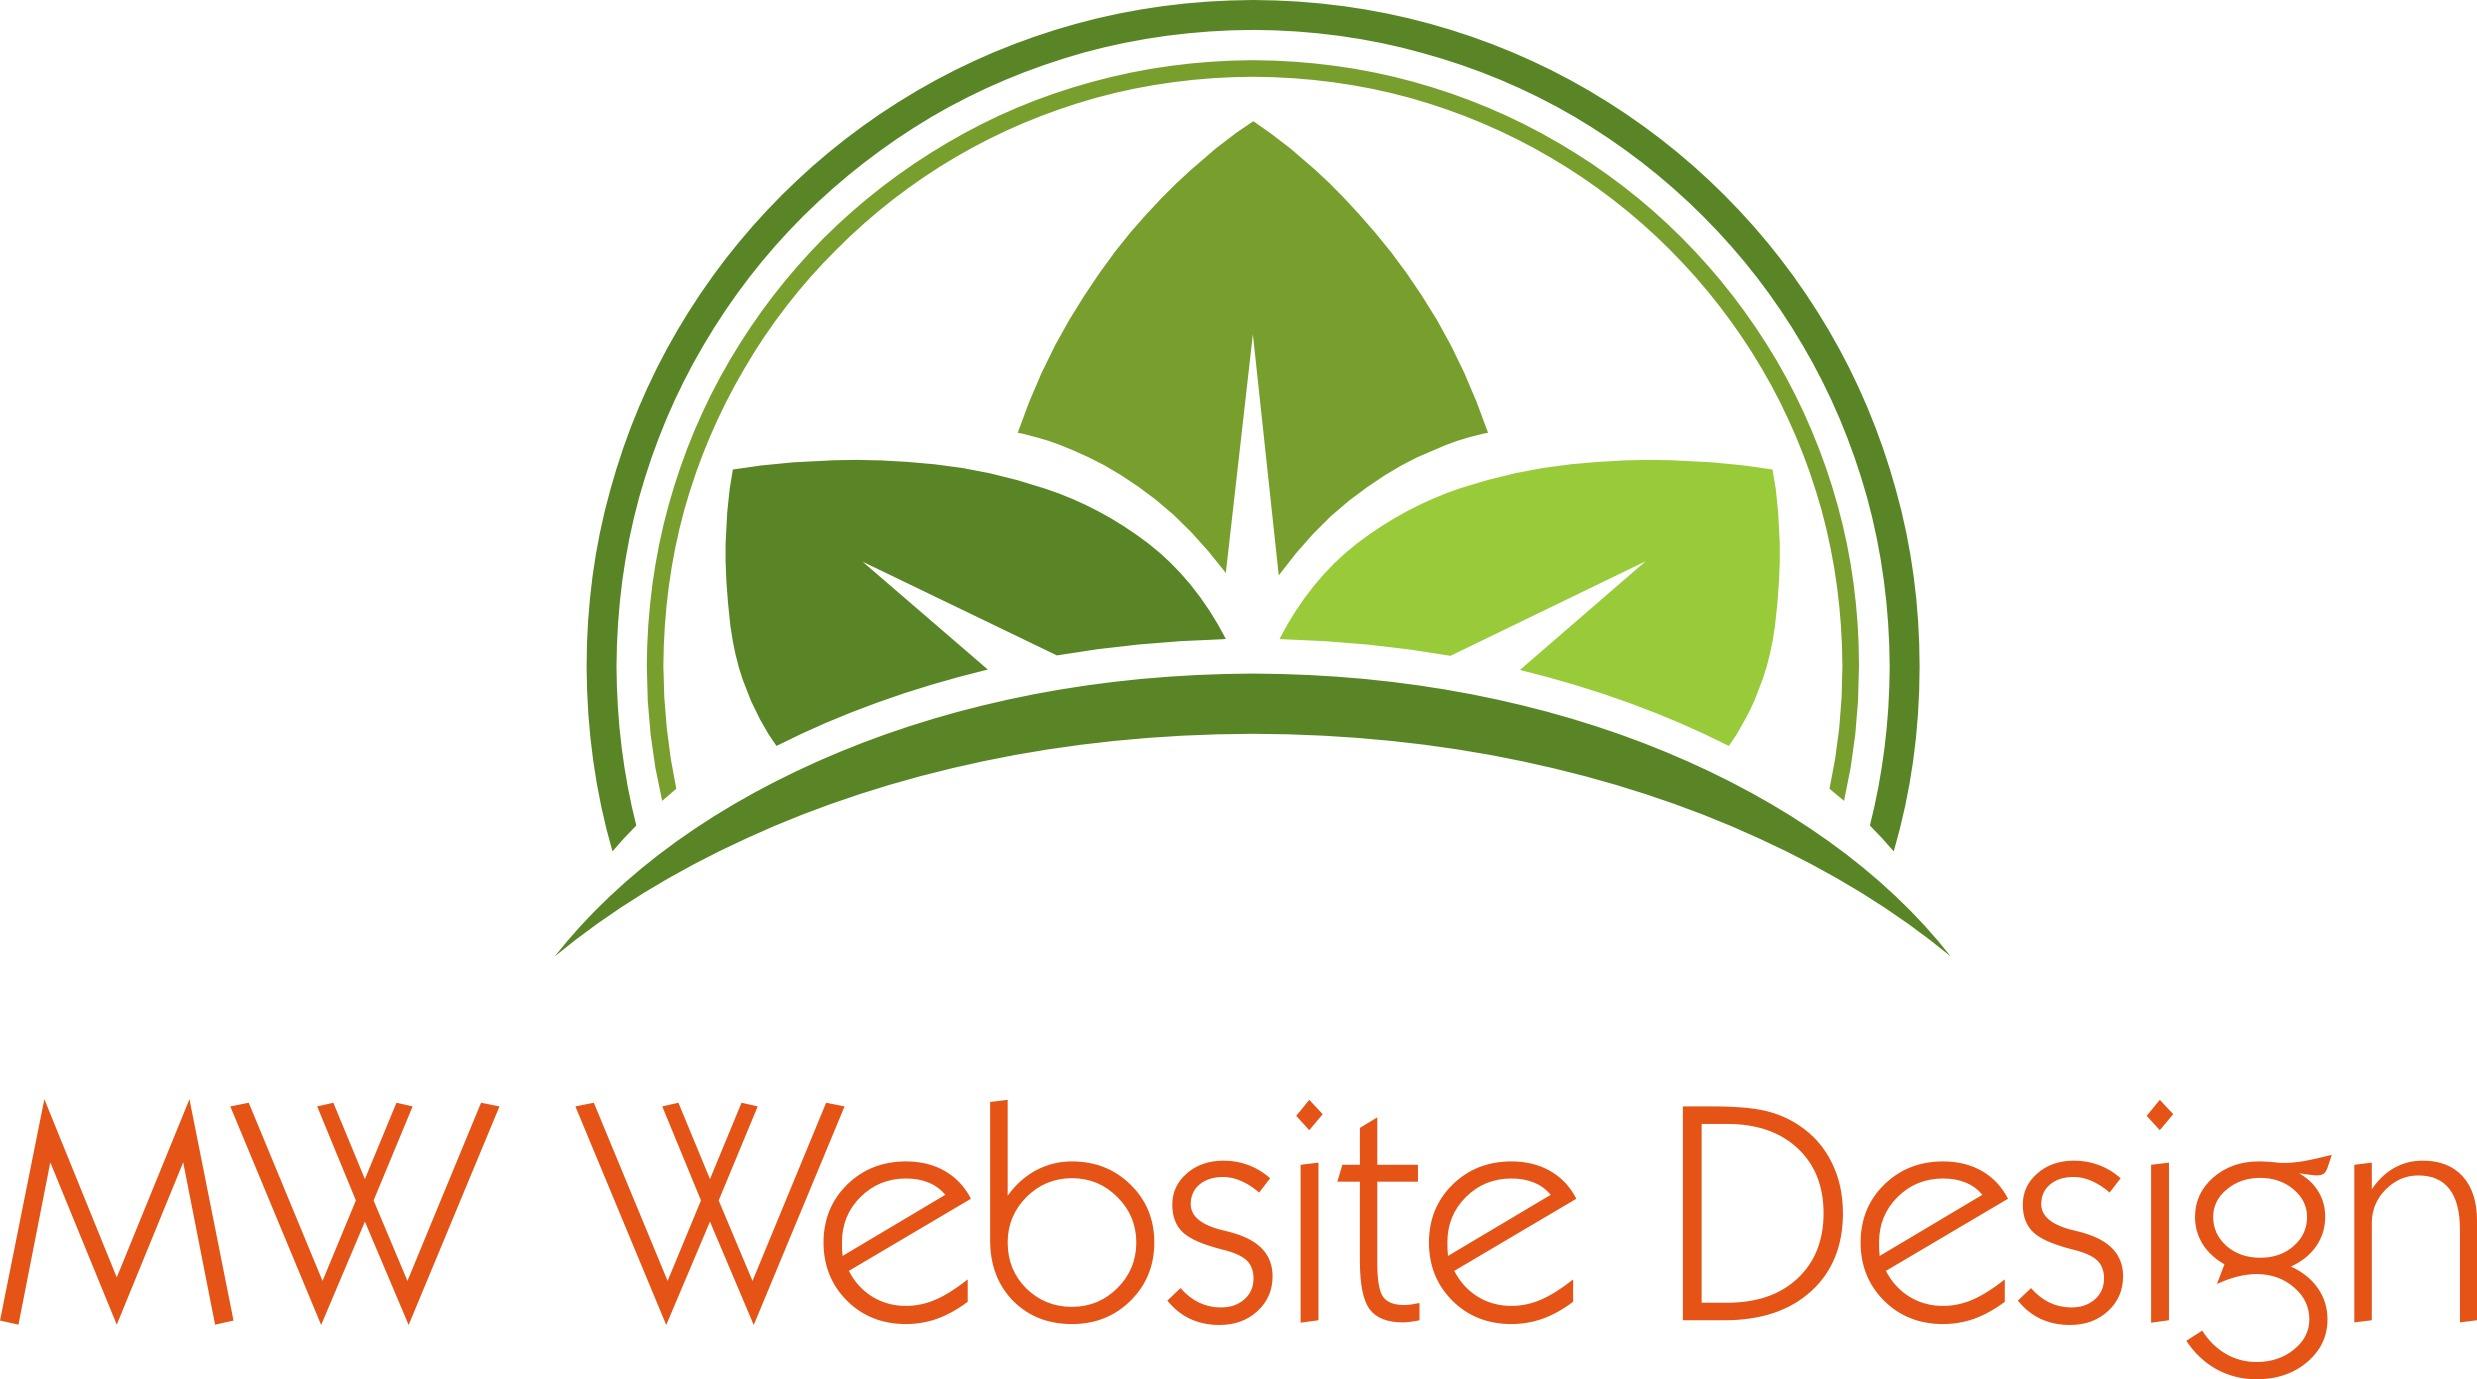 MW Website Design